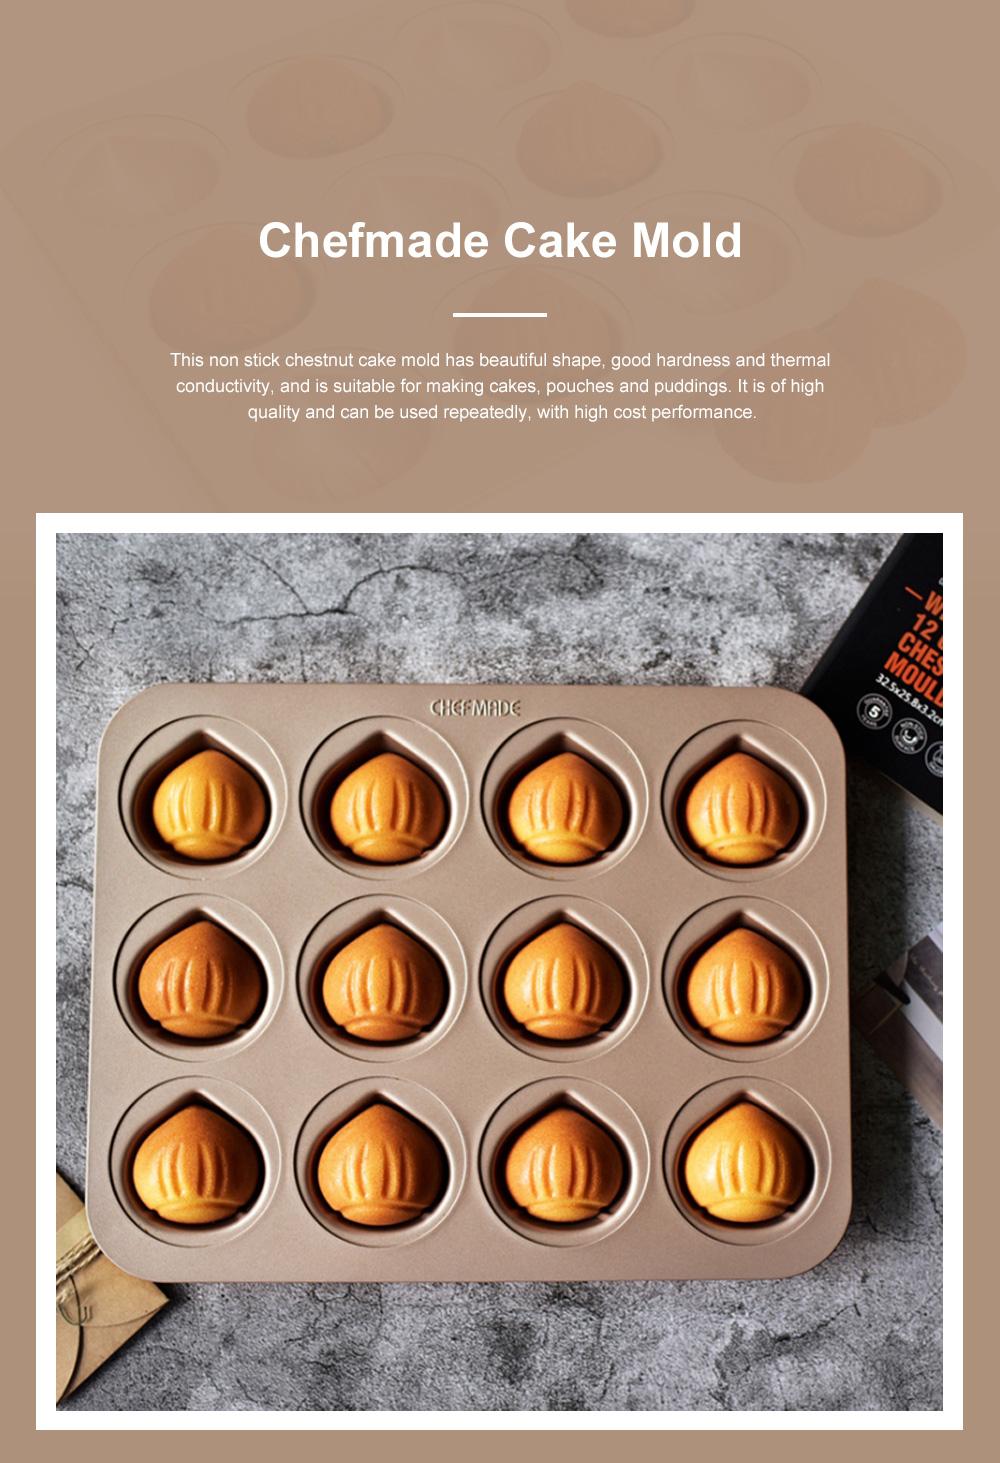 Chefmade 12 Cup Chestnut Cake Mold Non Stick Cake Mold Baking Plate Baking Mold Golden 0